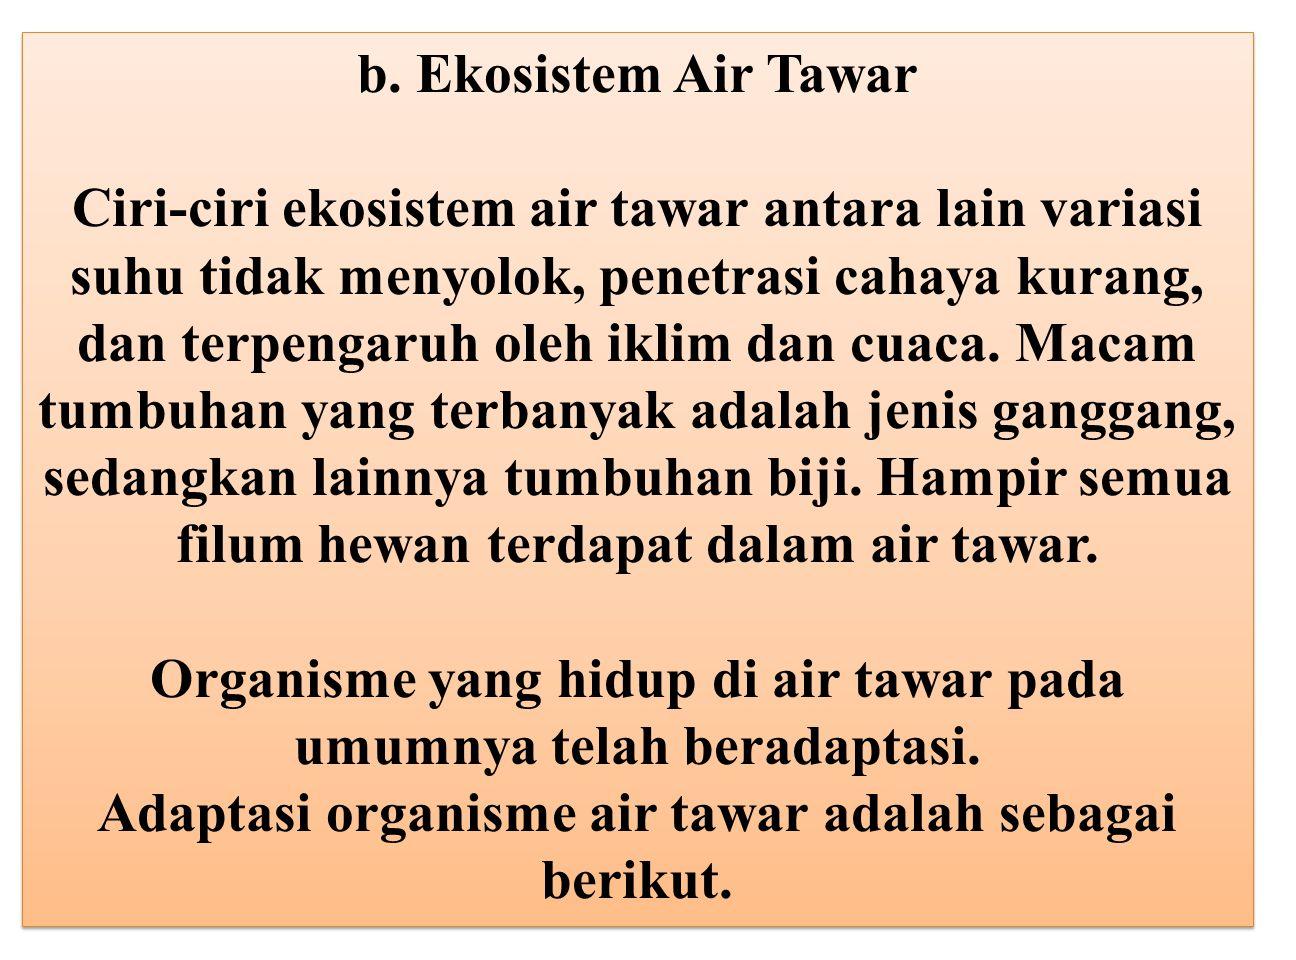 b. Ekosistem Air Tawar Ciri-ciri ekosistem air tawar antara lain variasi suhu tidak menyolok, penetrasi cahaya kurang, dan terpengaruh oleh iklim dan